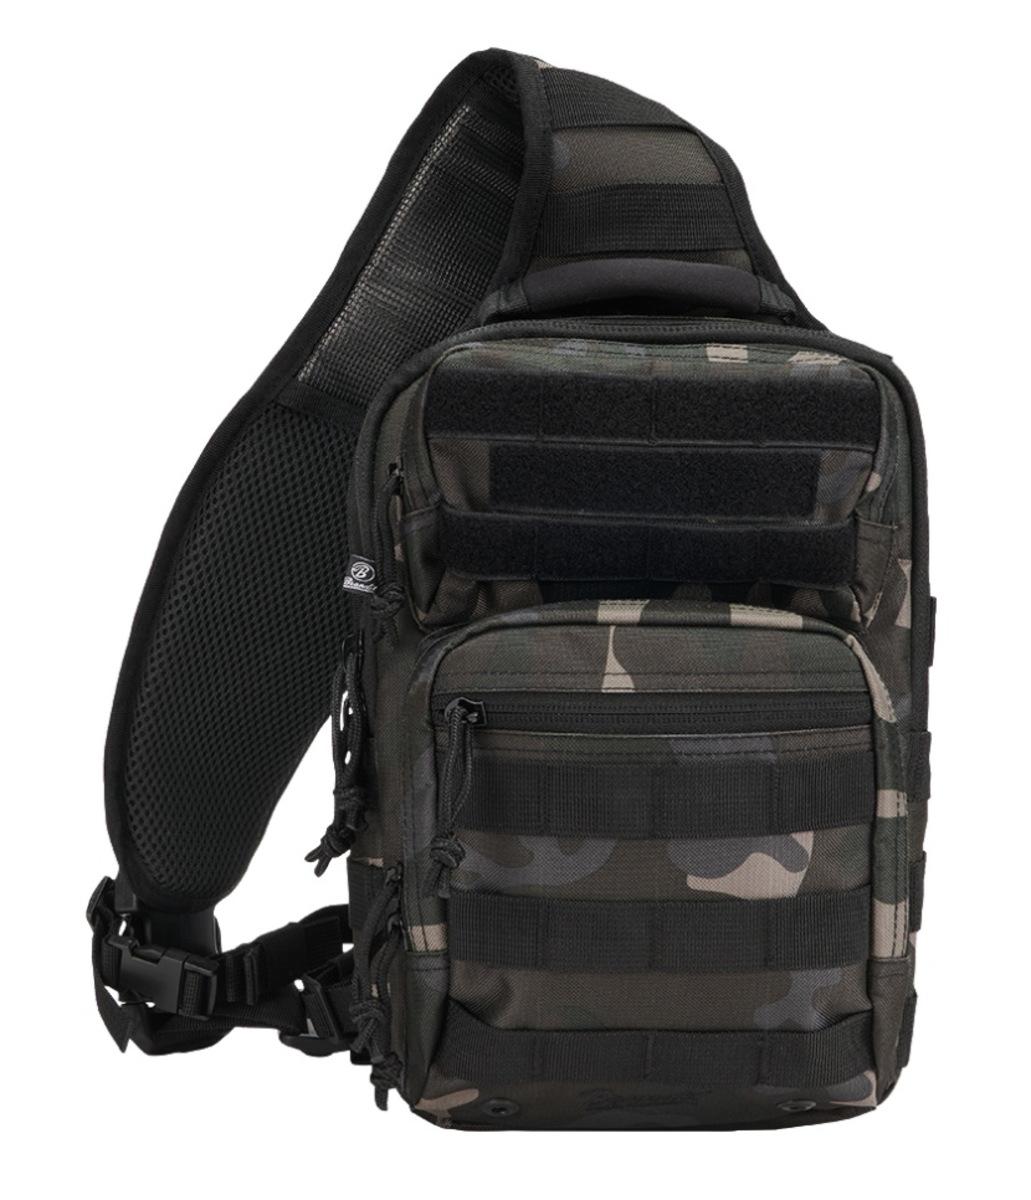 batoh (taška cez rameno) BRANDIT - US Cooper - 8036-darkcamo